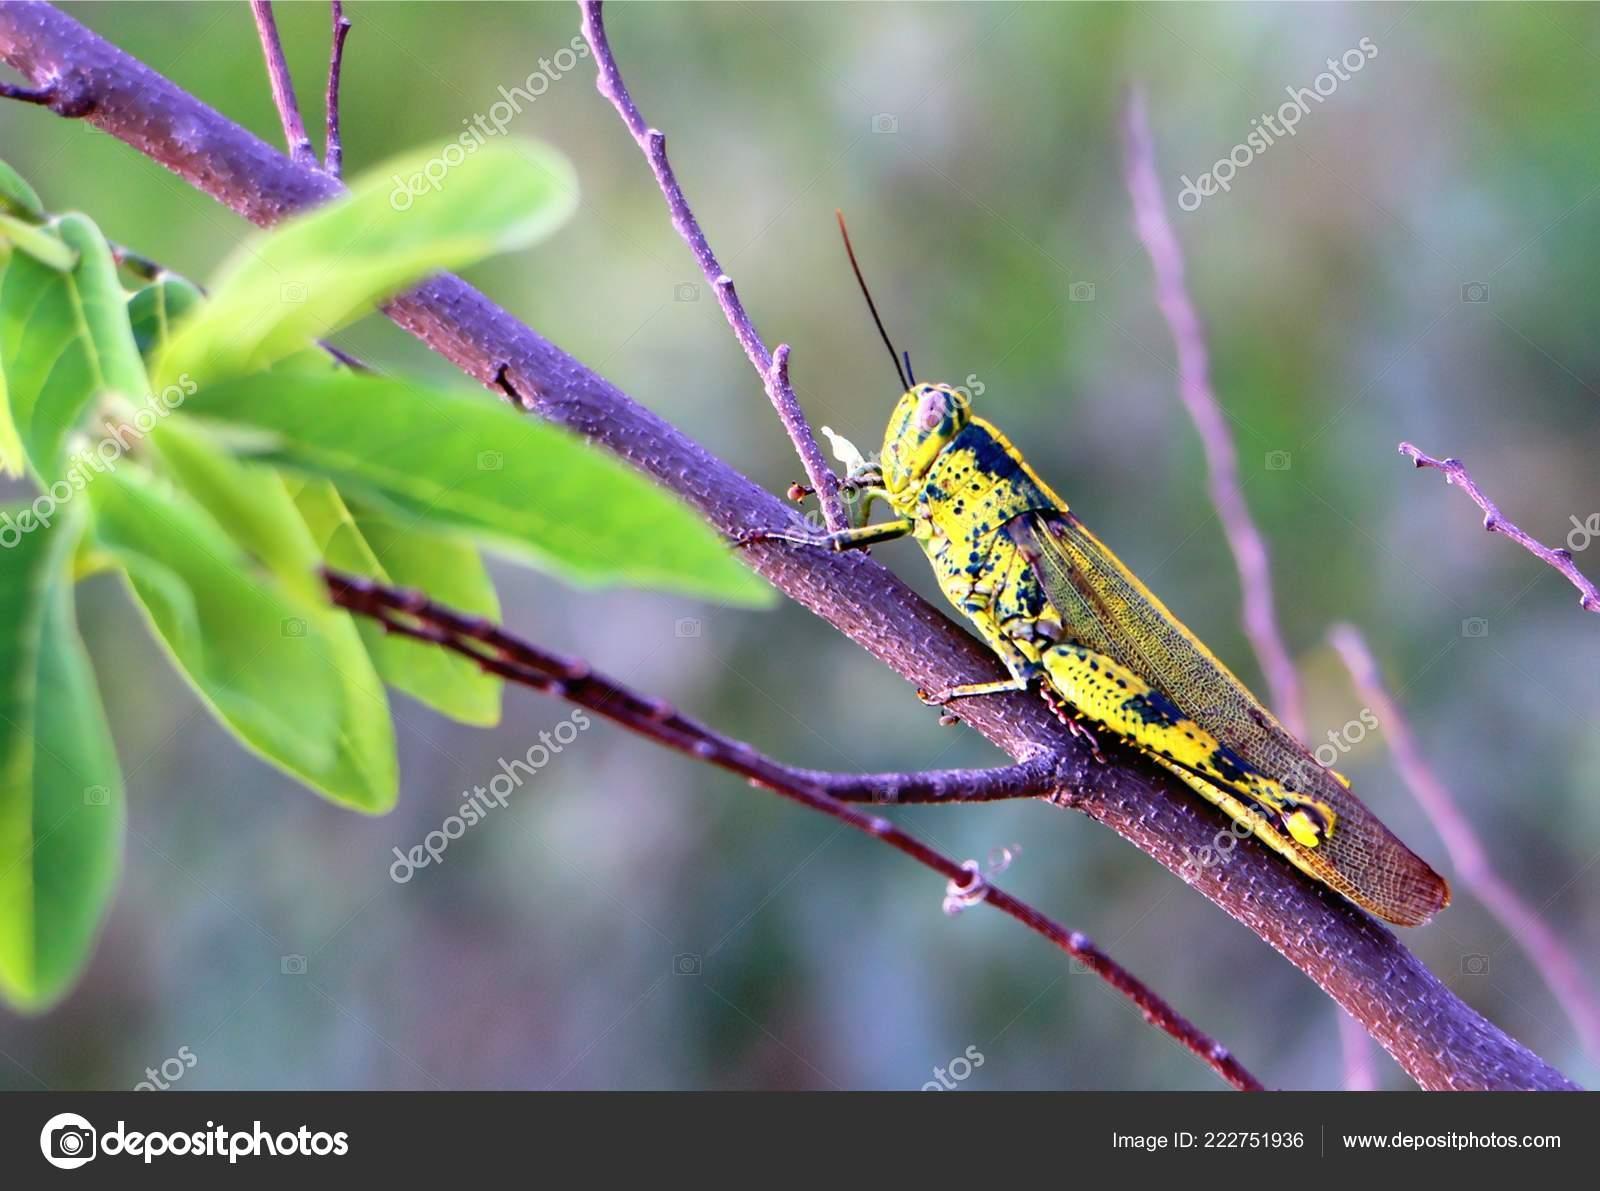 Grasshopper Valanga Nigricornis Close Also Known Belalang Kunyit Stock Photo C Razihusin 222751936